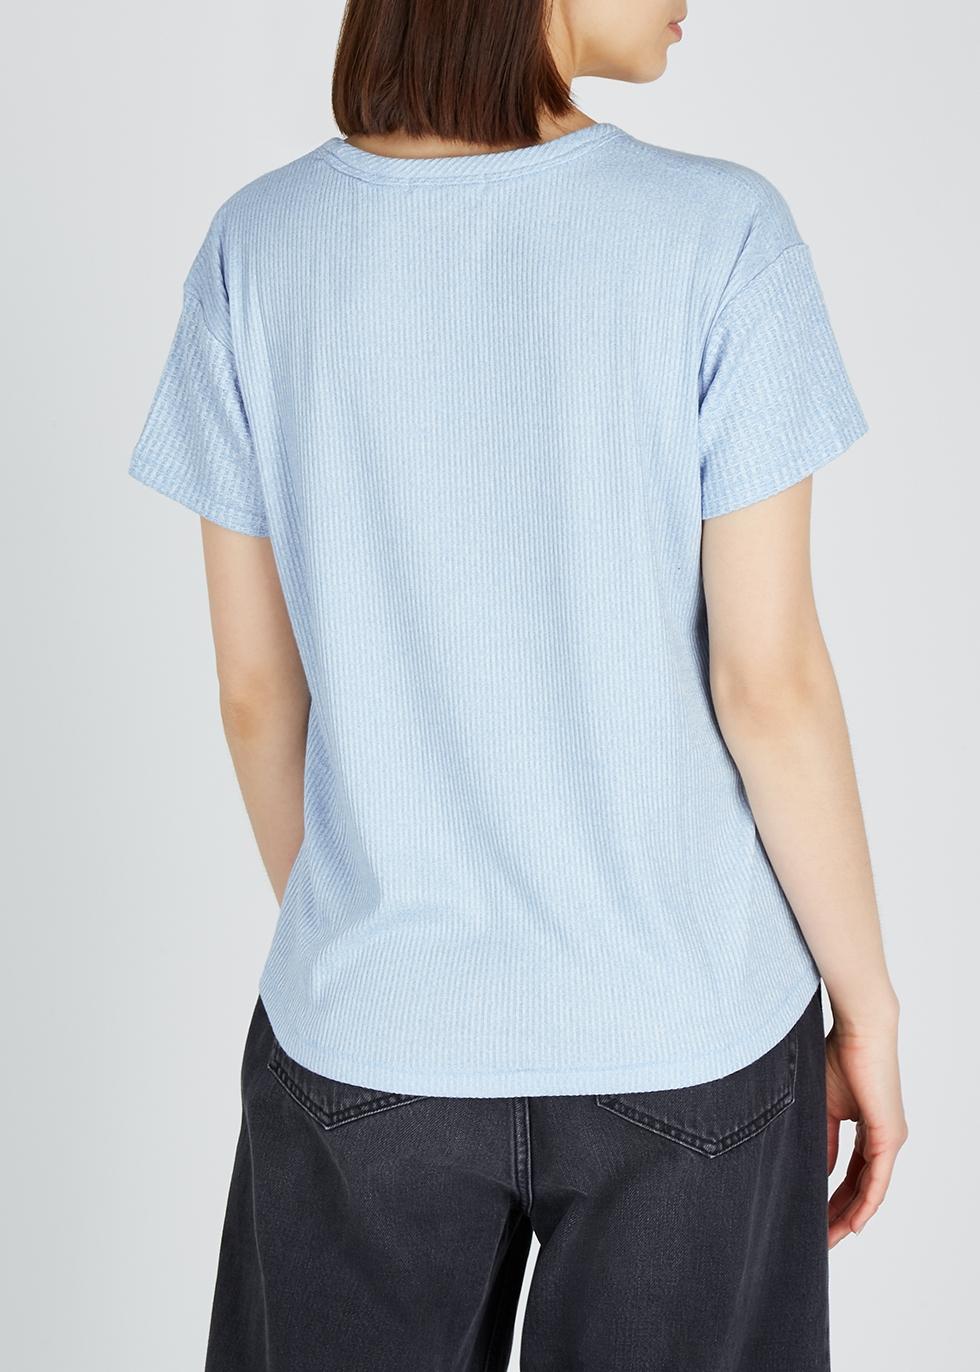 Clara Torqued blue jersey T-shirt - rag & bone /JEAN